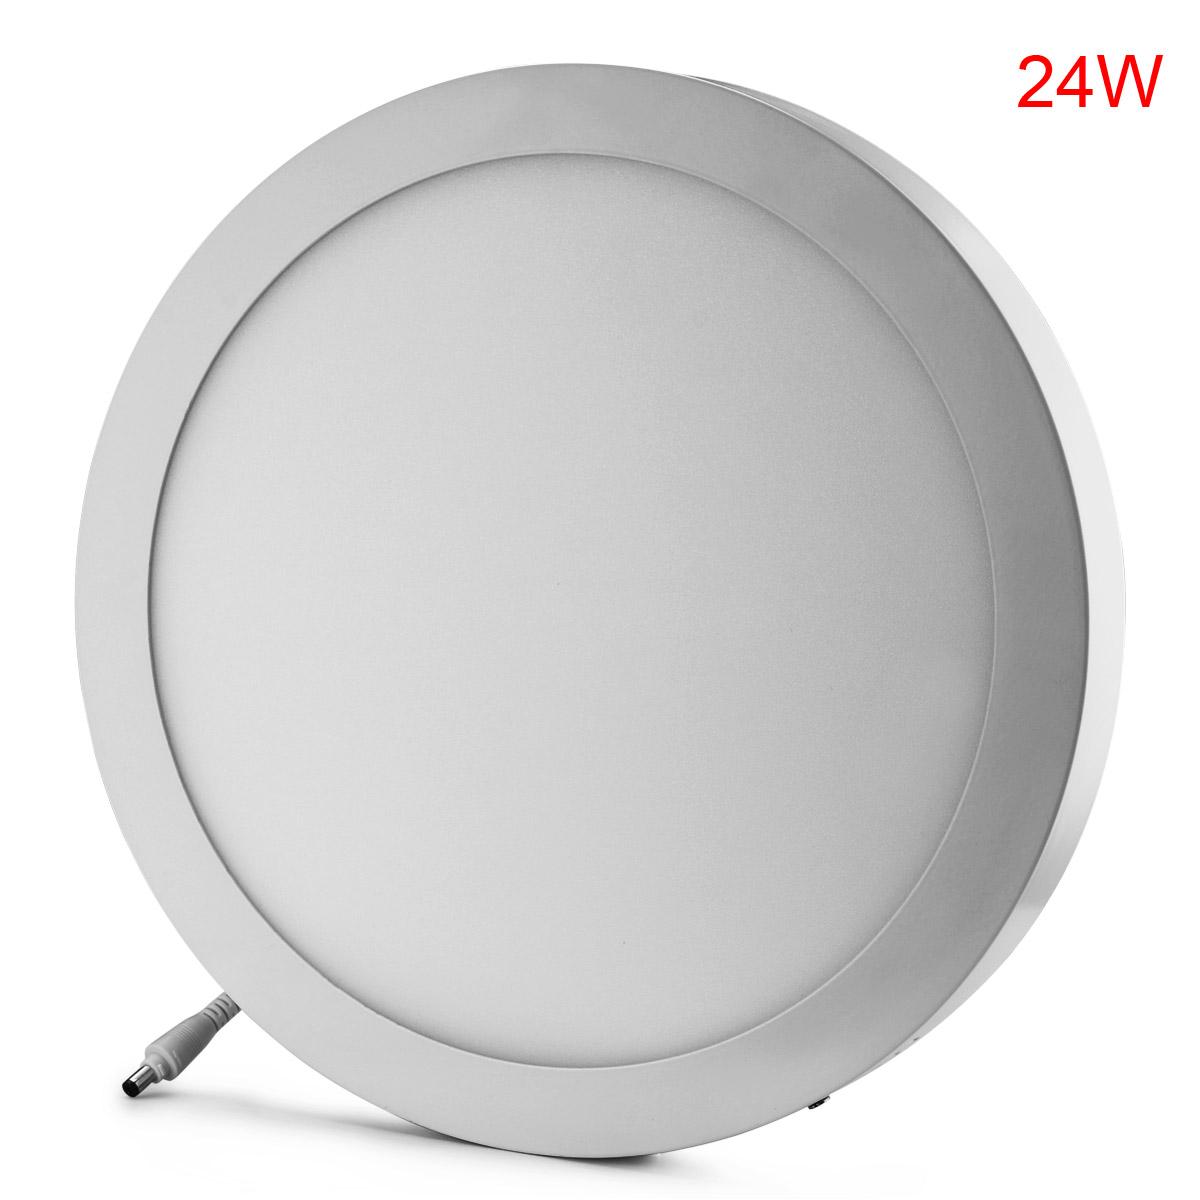 ac85 265v led recessed ceiling flat panel light round square w led driver ebay. Black Bedroom Furniture Sets. Home Design Ideas